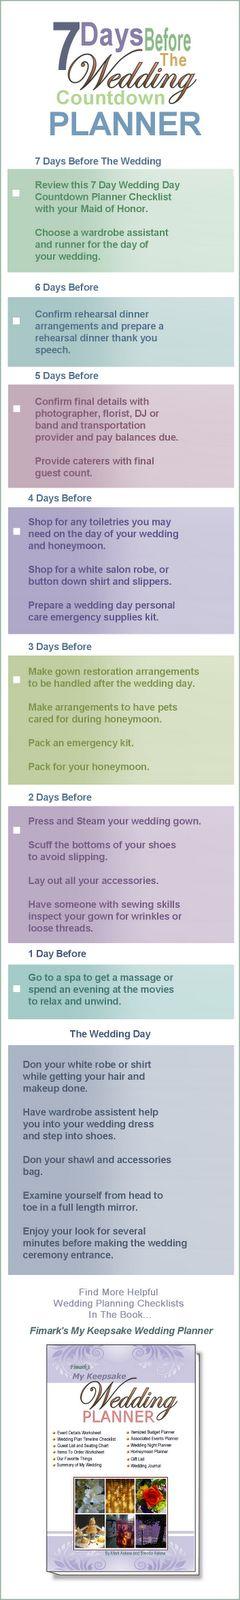 7 Day Wedding Countdown Checklist